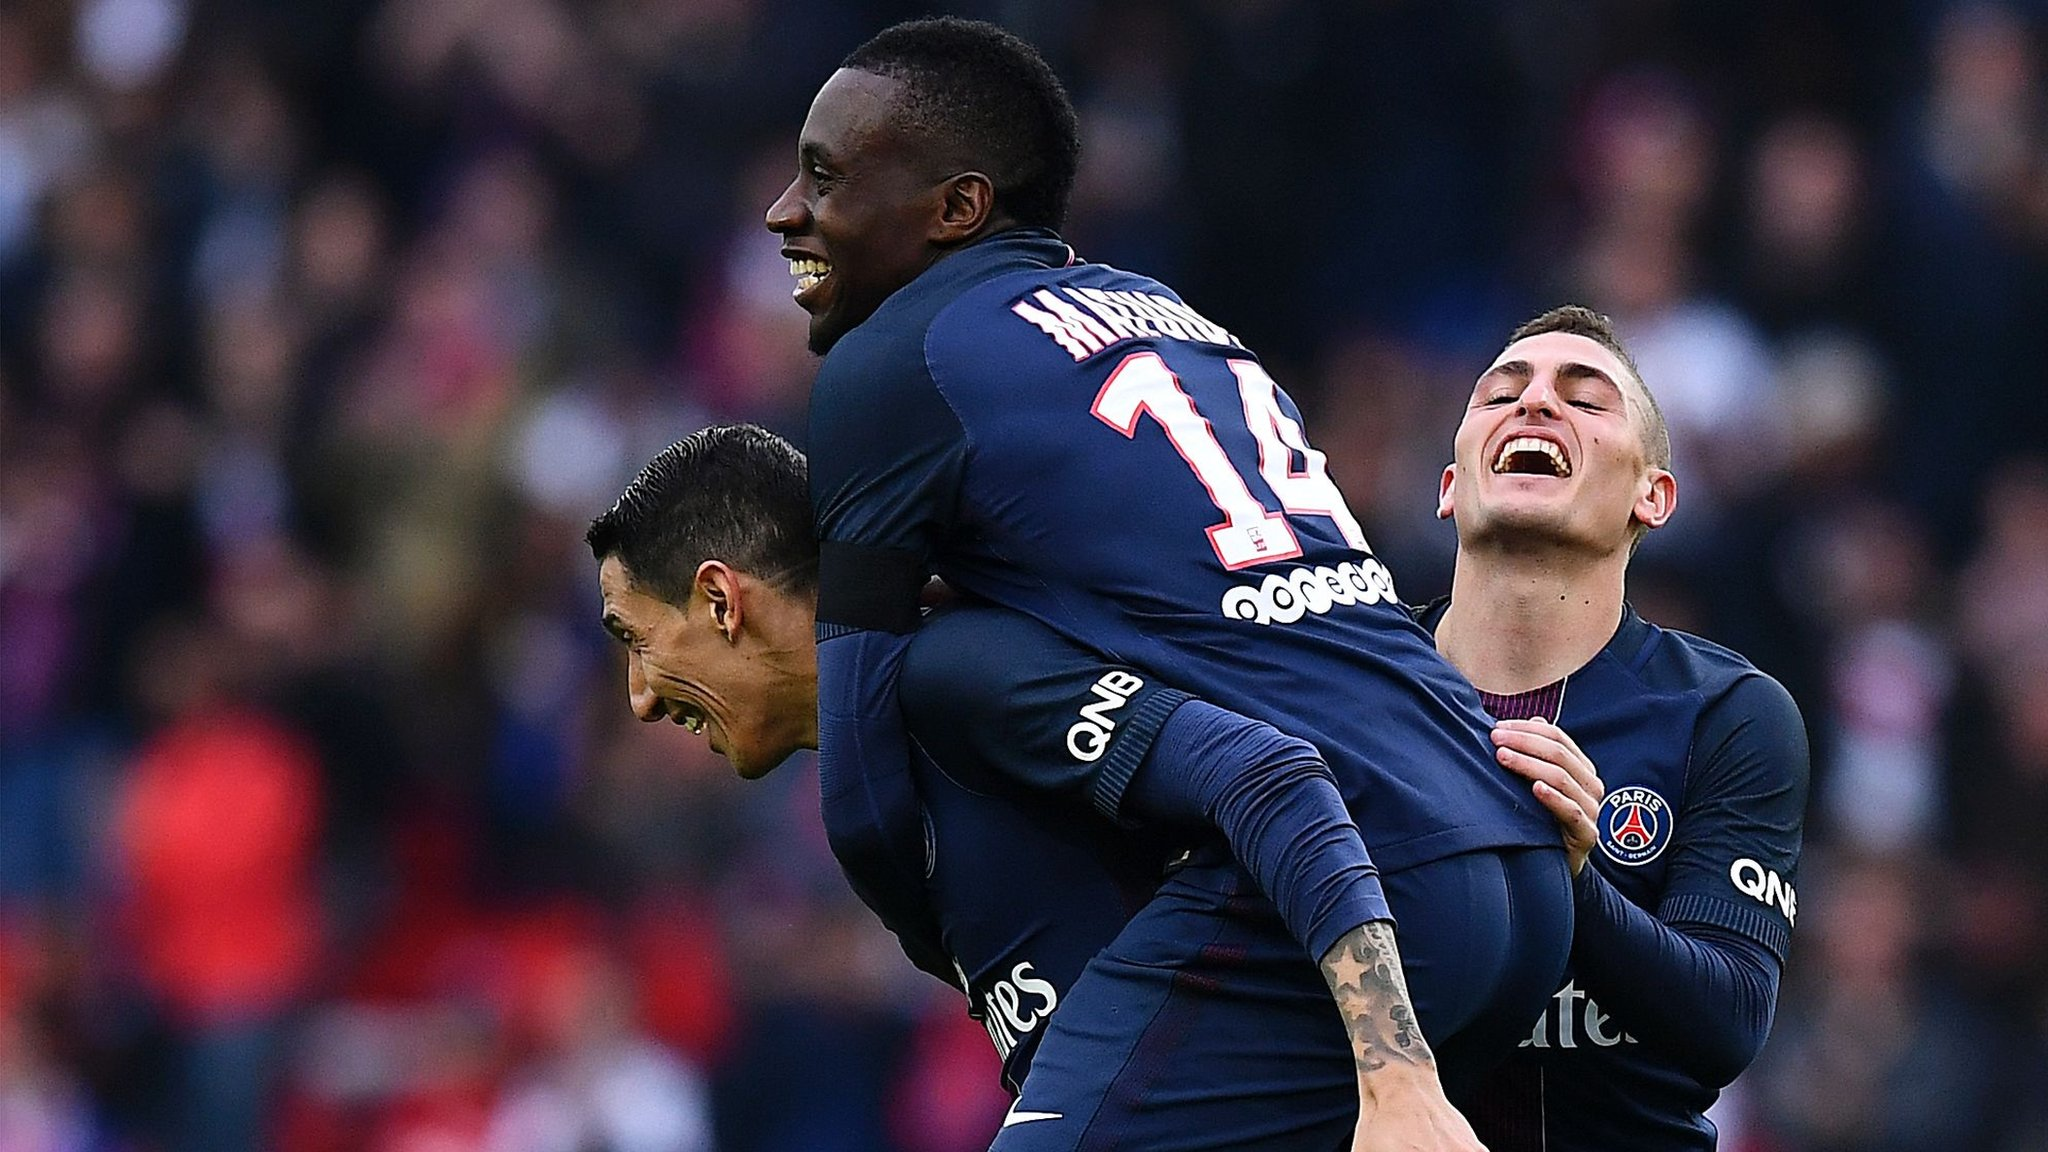 Champions Paris St-Germain go top in France